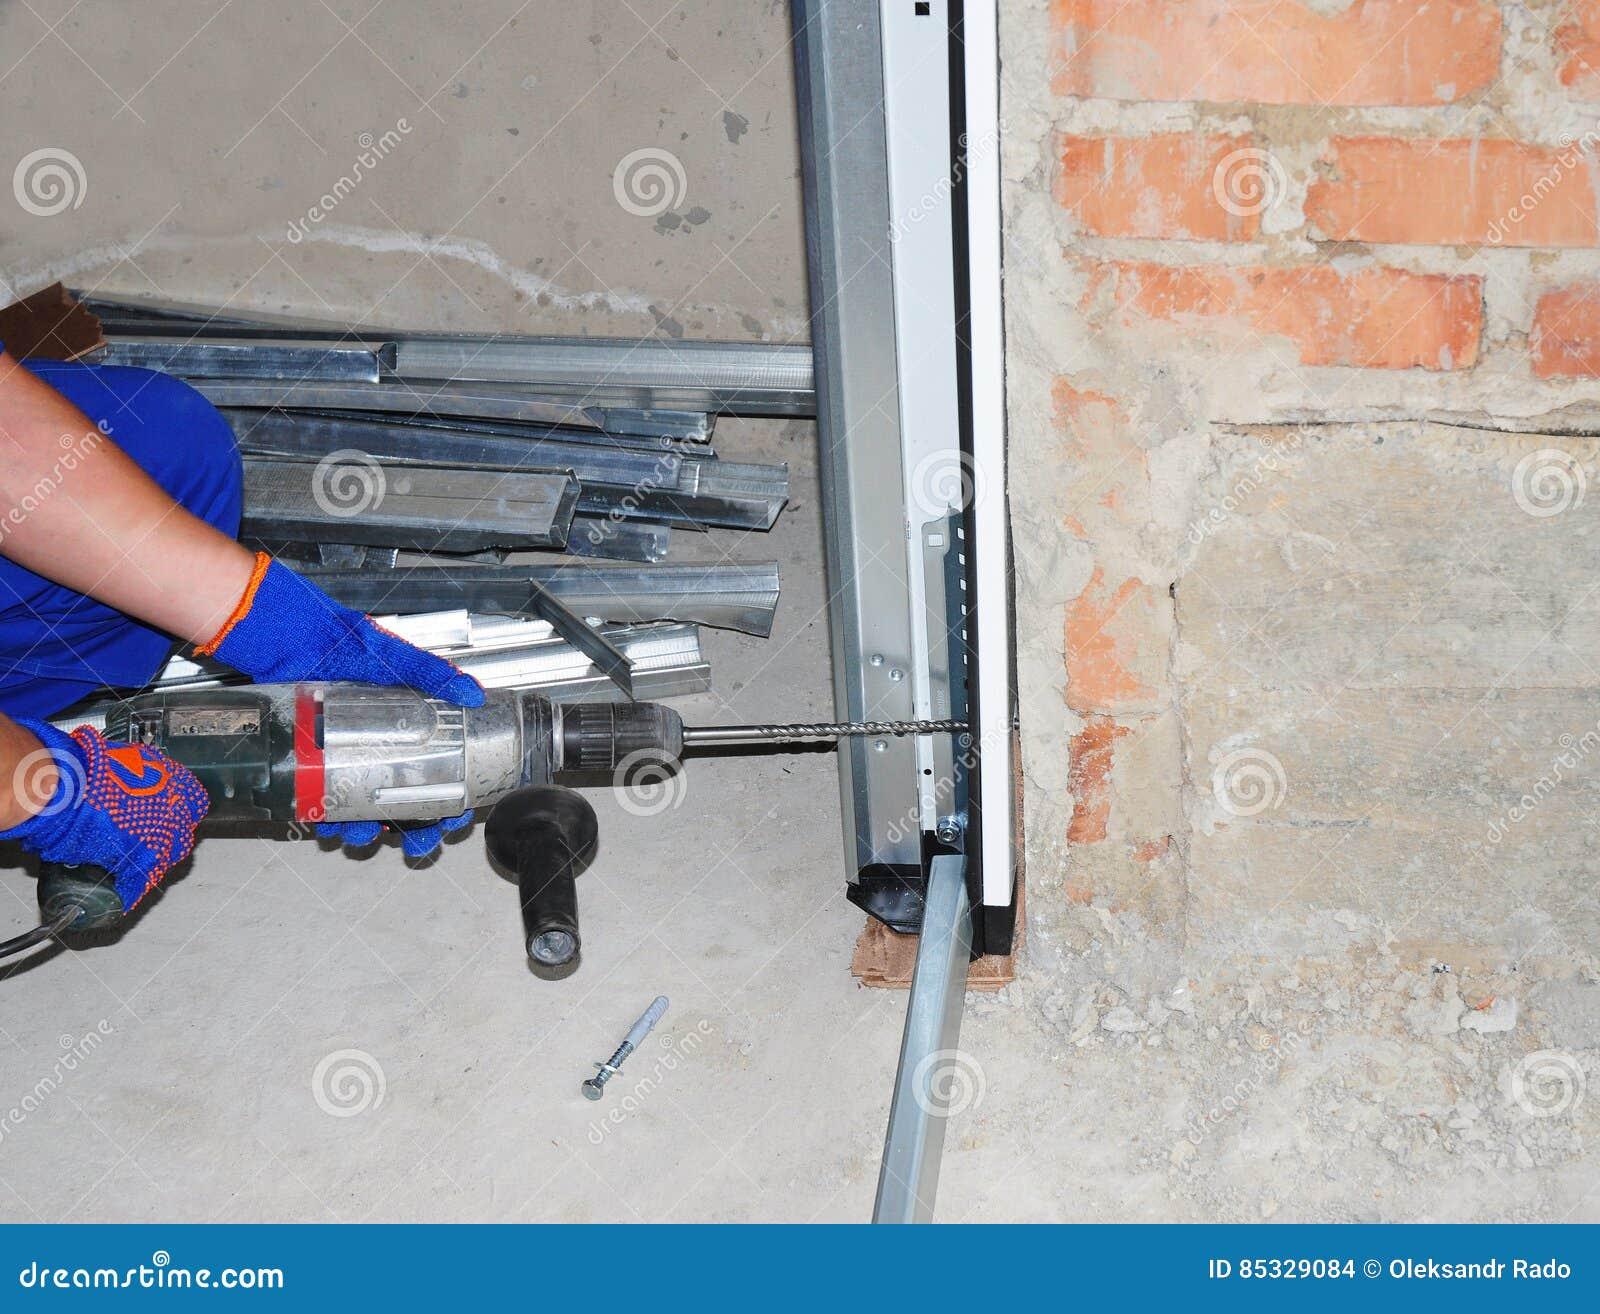 Garage Door Installation & Replacement. Install Garage